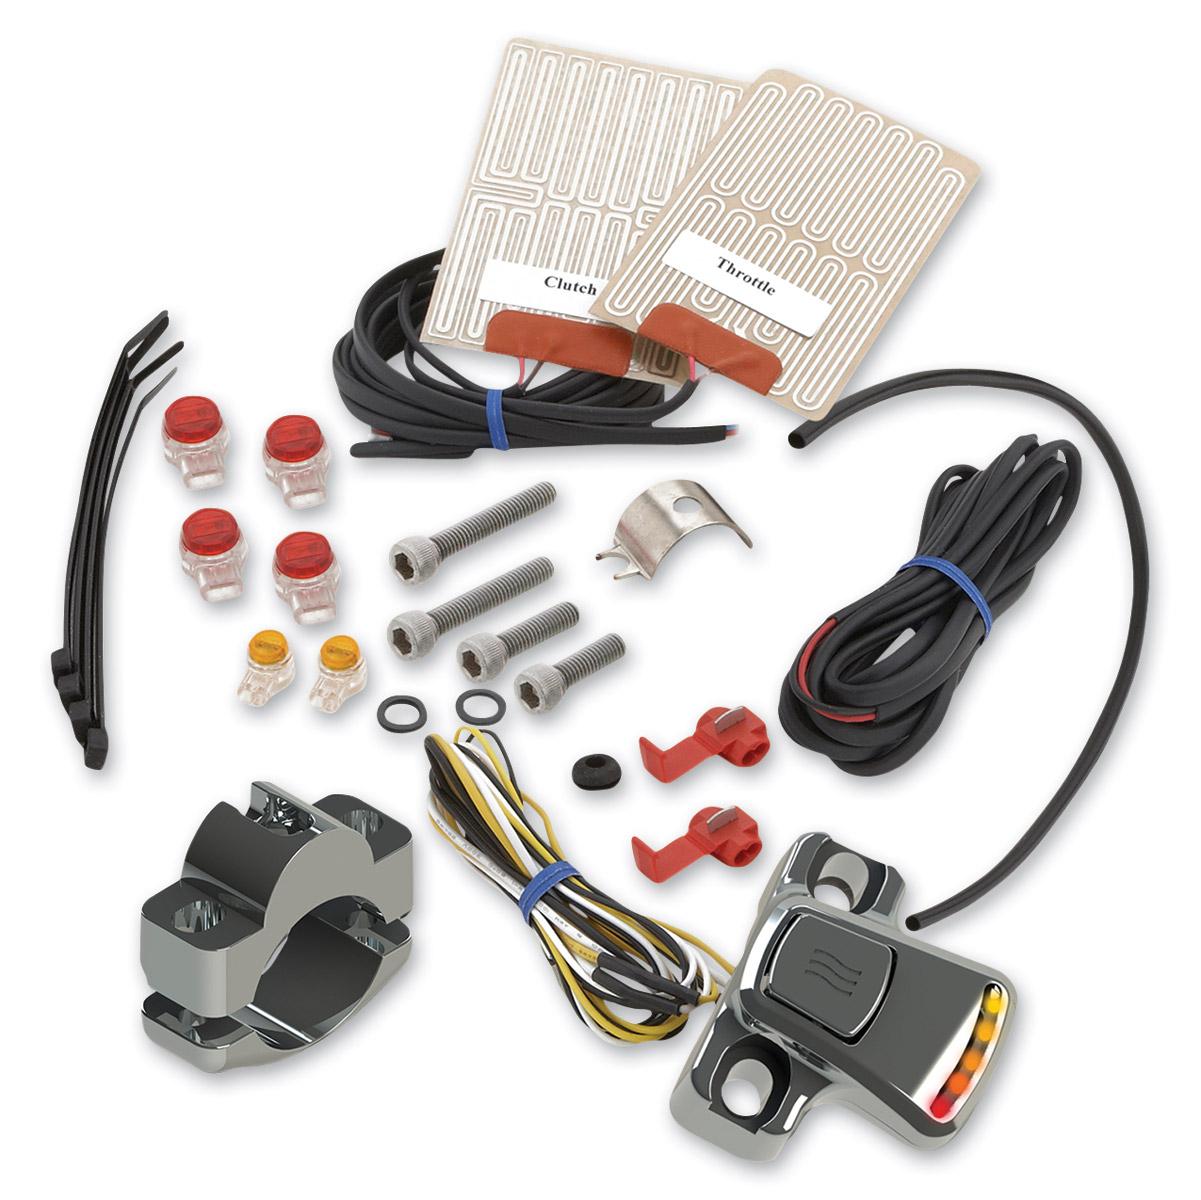 Heat Demon Chrome External Grip Warmer Kit for Metric Models